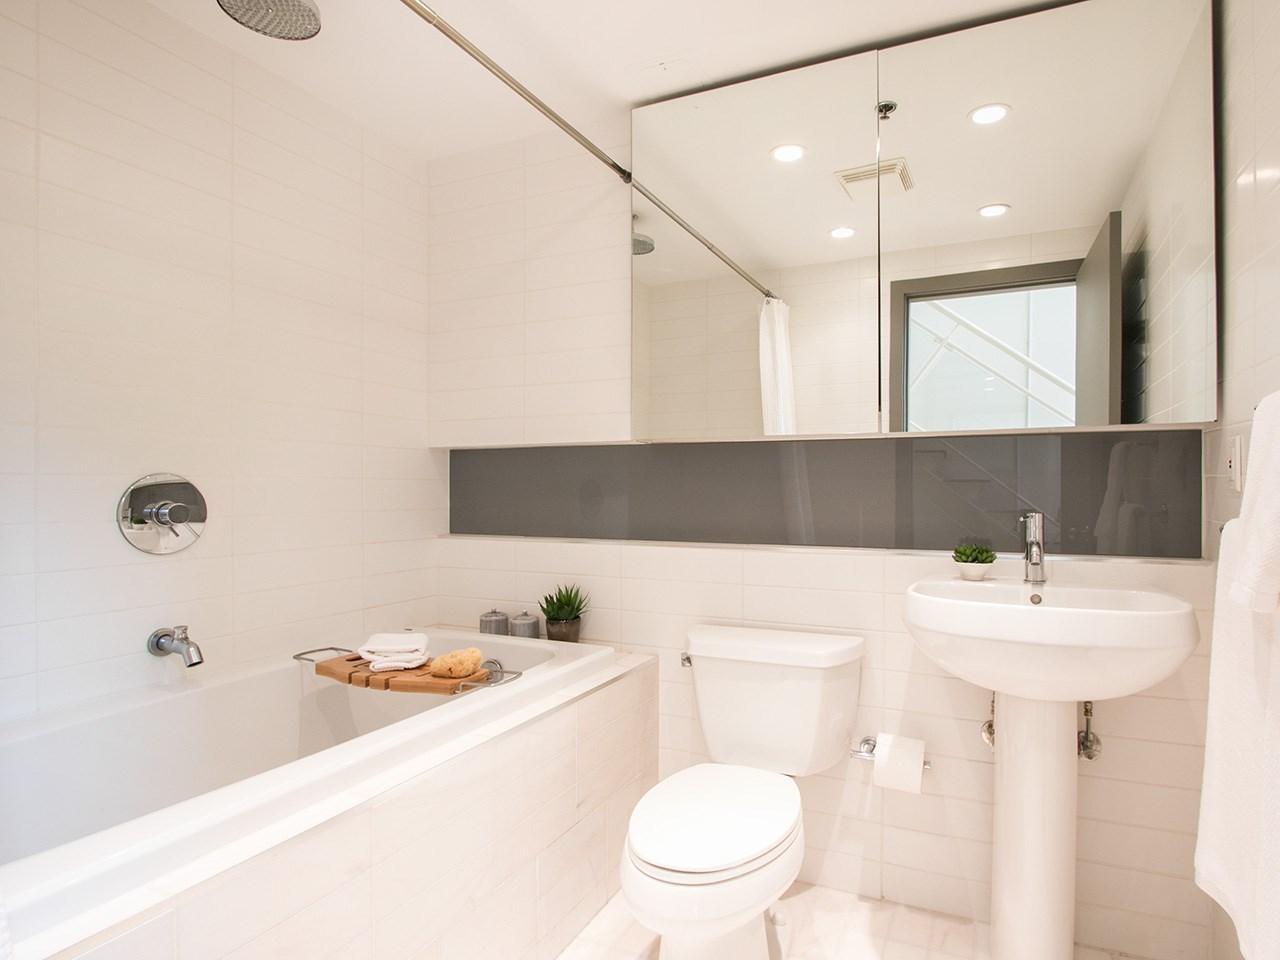 Condo Apartment at 403 1529 W 6TH AVENUE, Unit 403, Vancouver West, British Columbia. Image 10